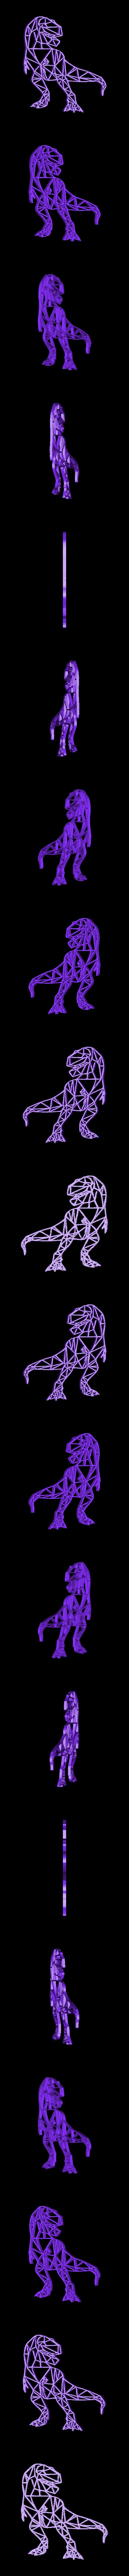 rex1.stl Download free STL file T-Rex Wall Sculpture 2D • 3D printable template, UnpredictableLab